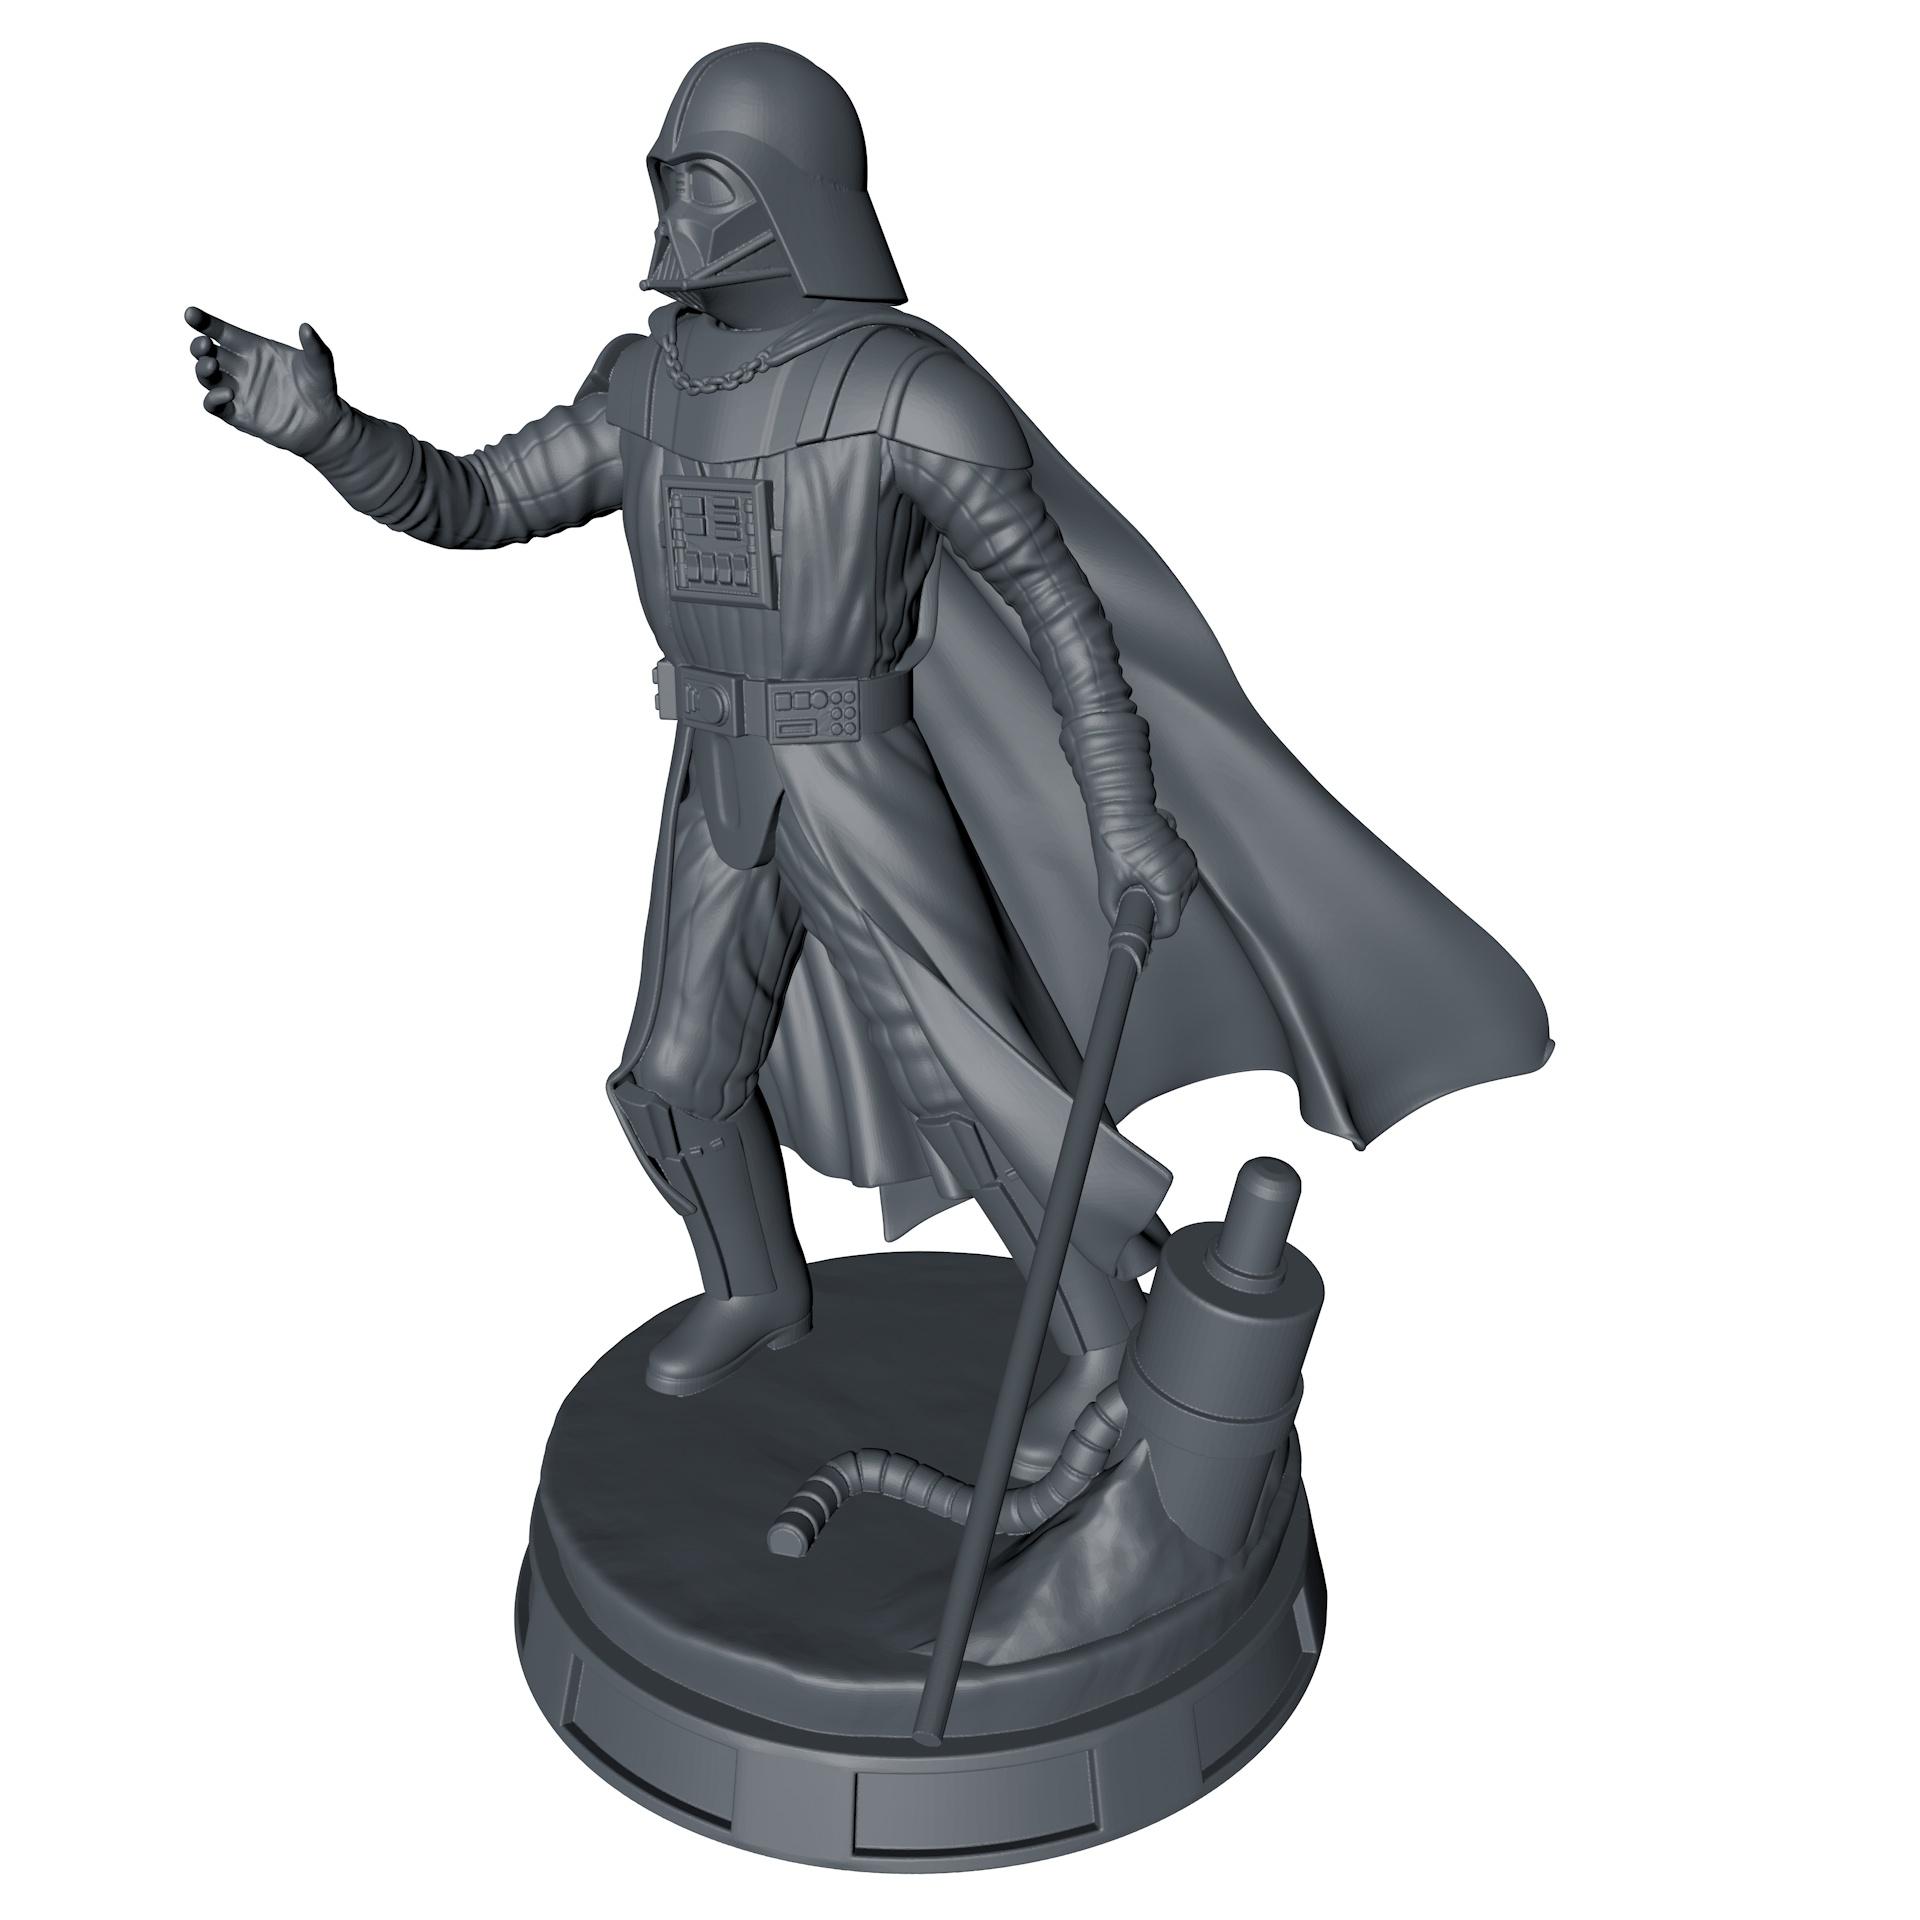 Darth Vader 3d printing model